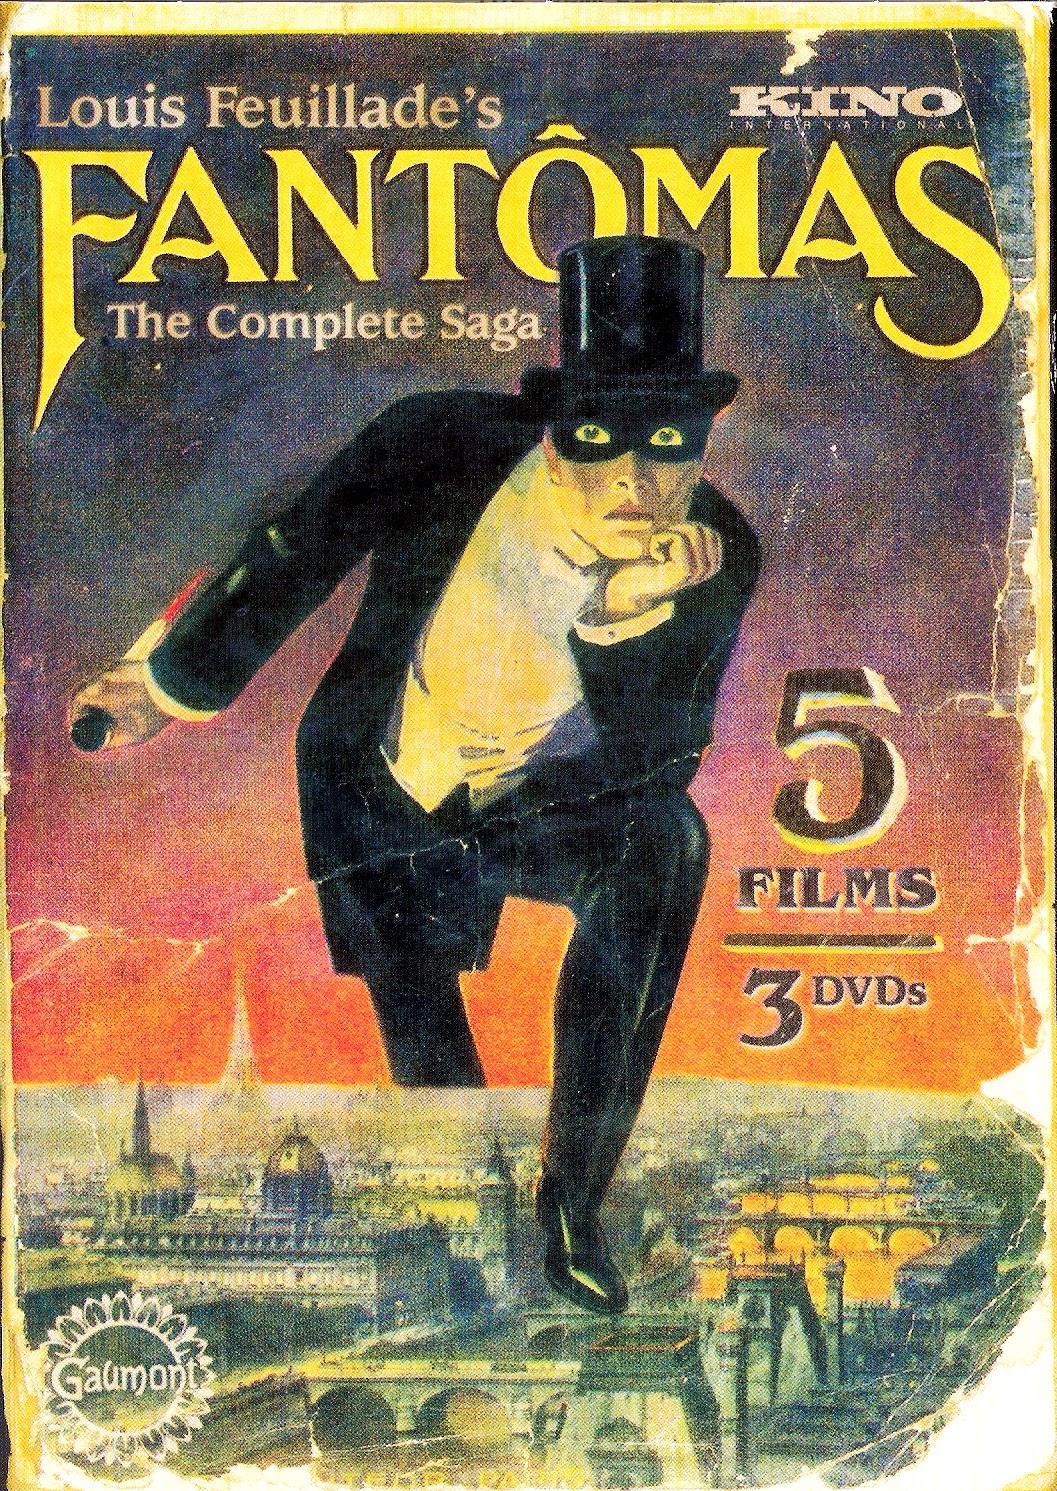 Fantomas movie poster